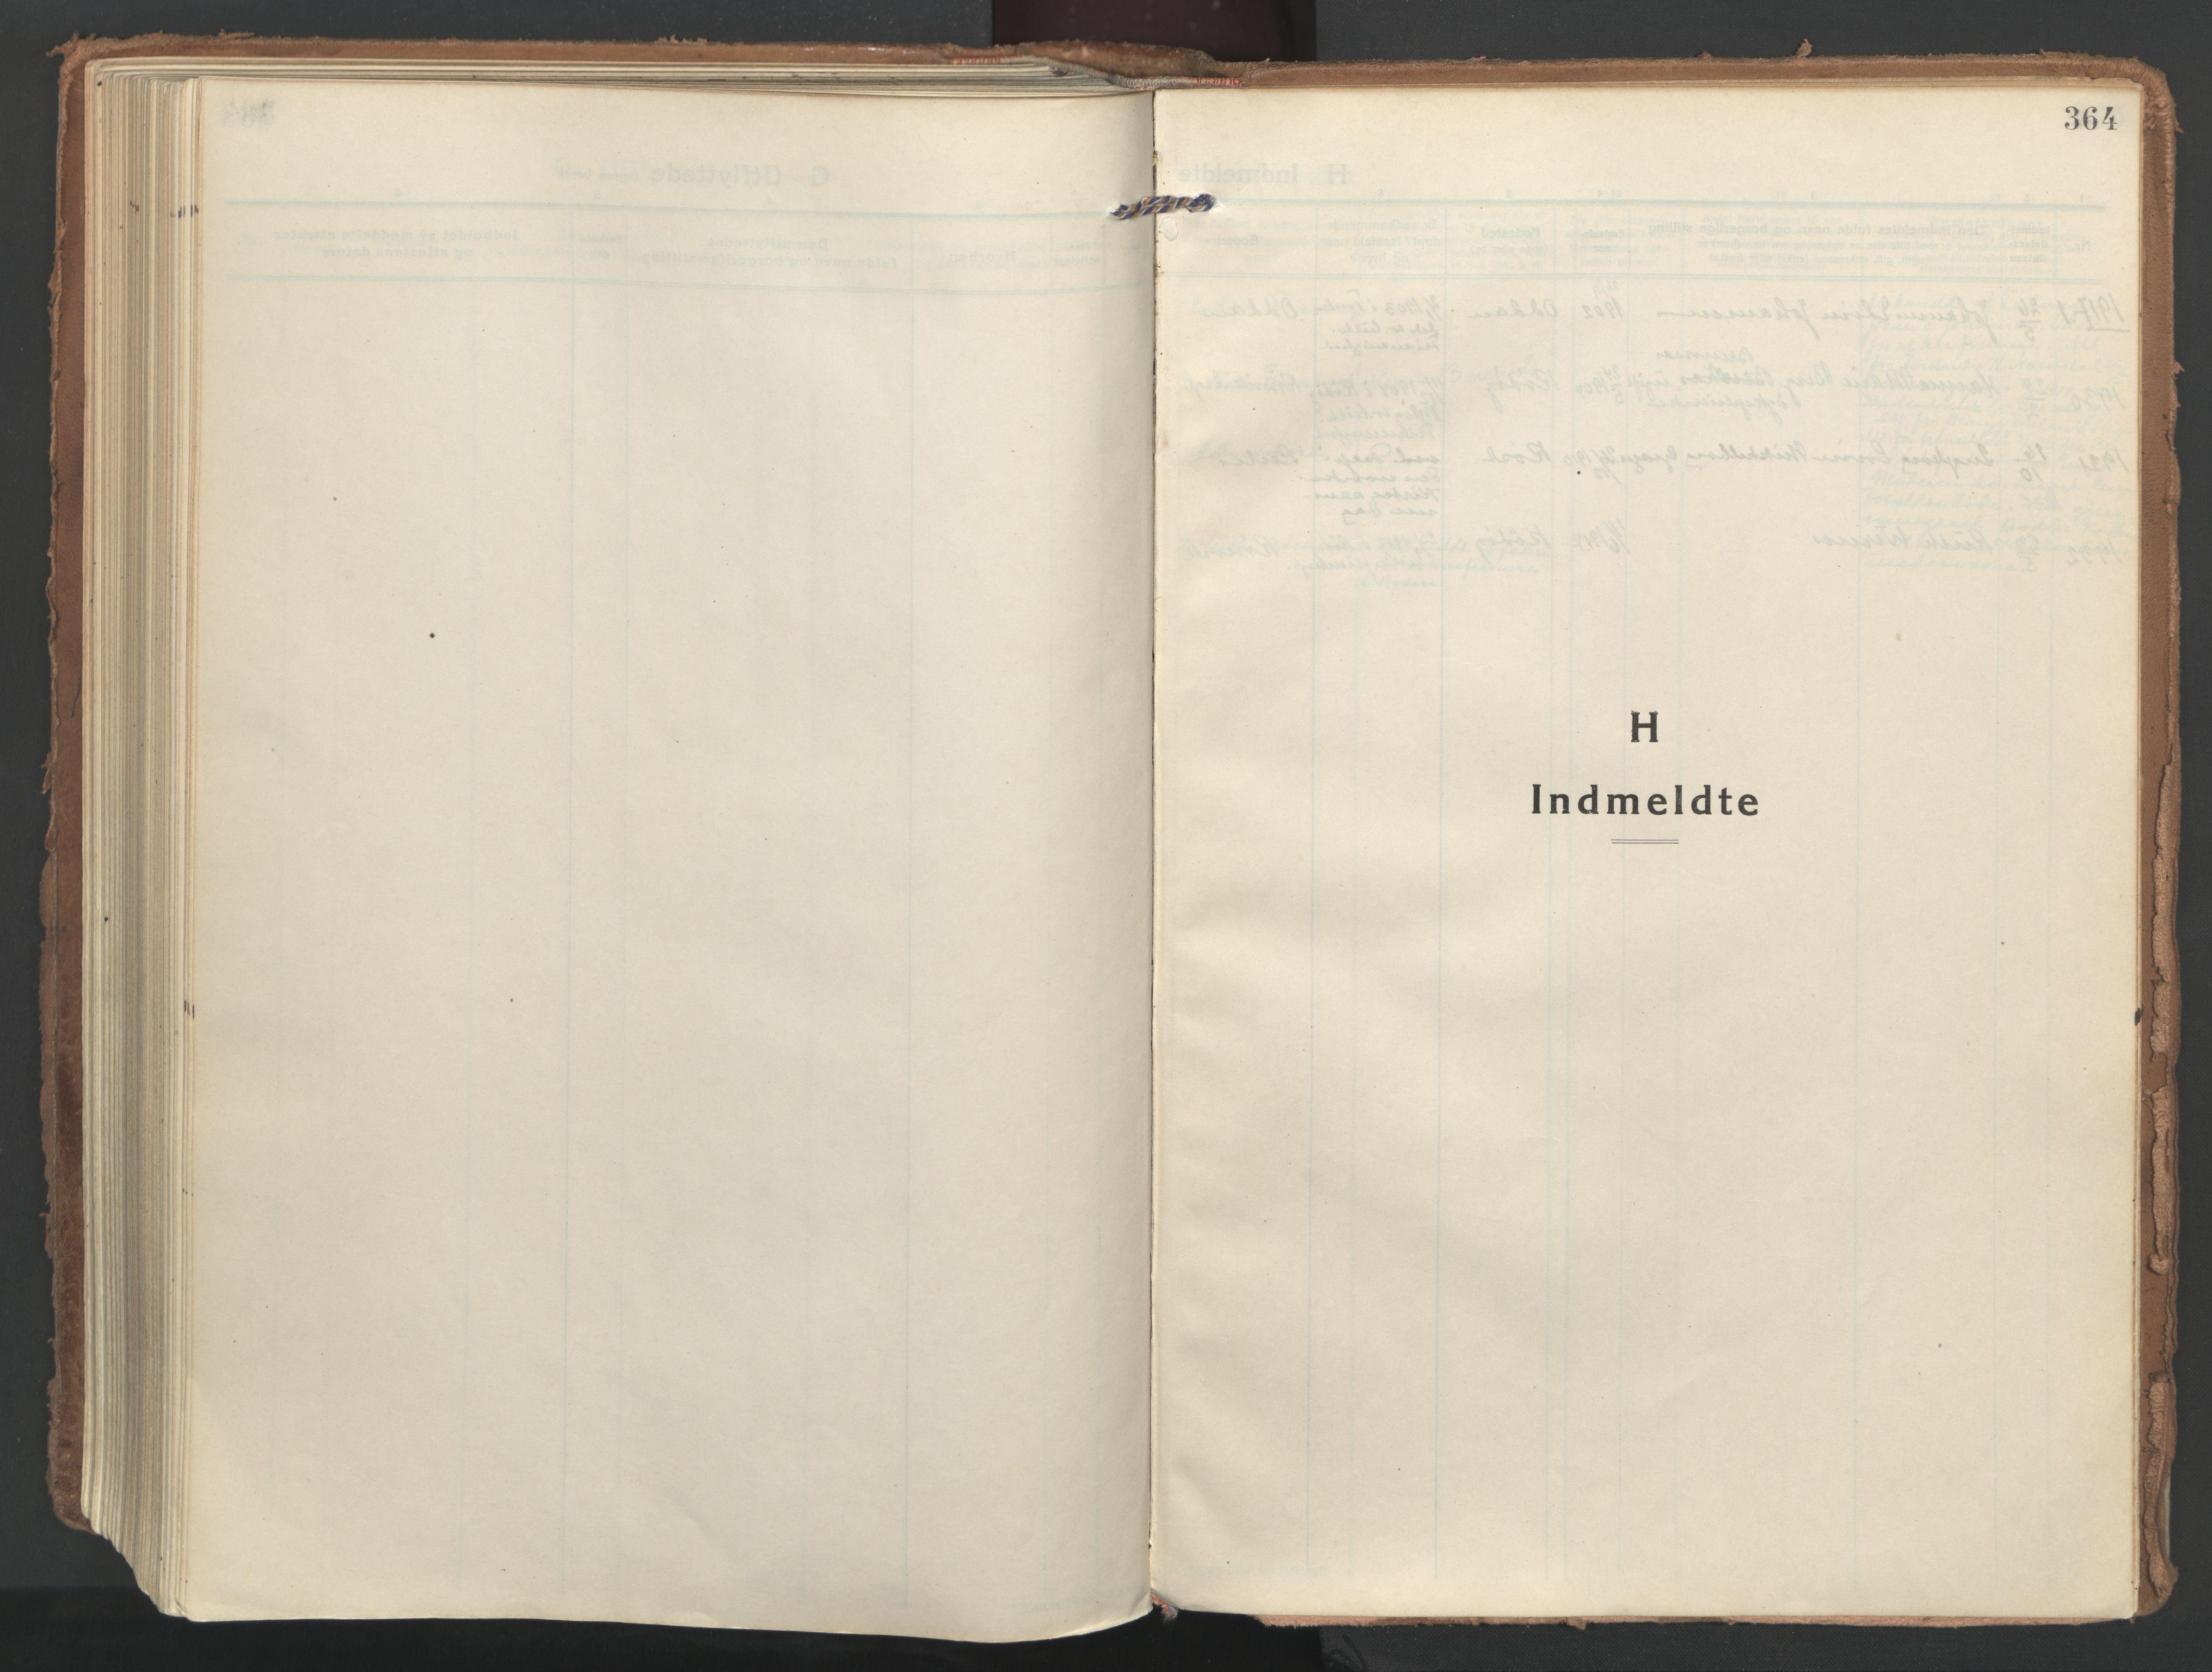 SAT, Ministerialprotokoller, klokkerbøker og fødselsregistre - Nordland, 802/L0060: Ministerialbok nr. 802A07, 1916-1933, s. 364